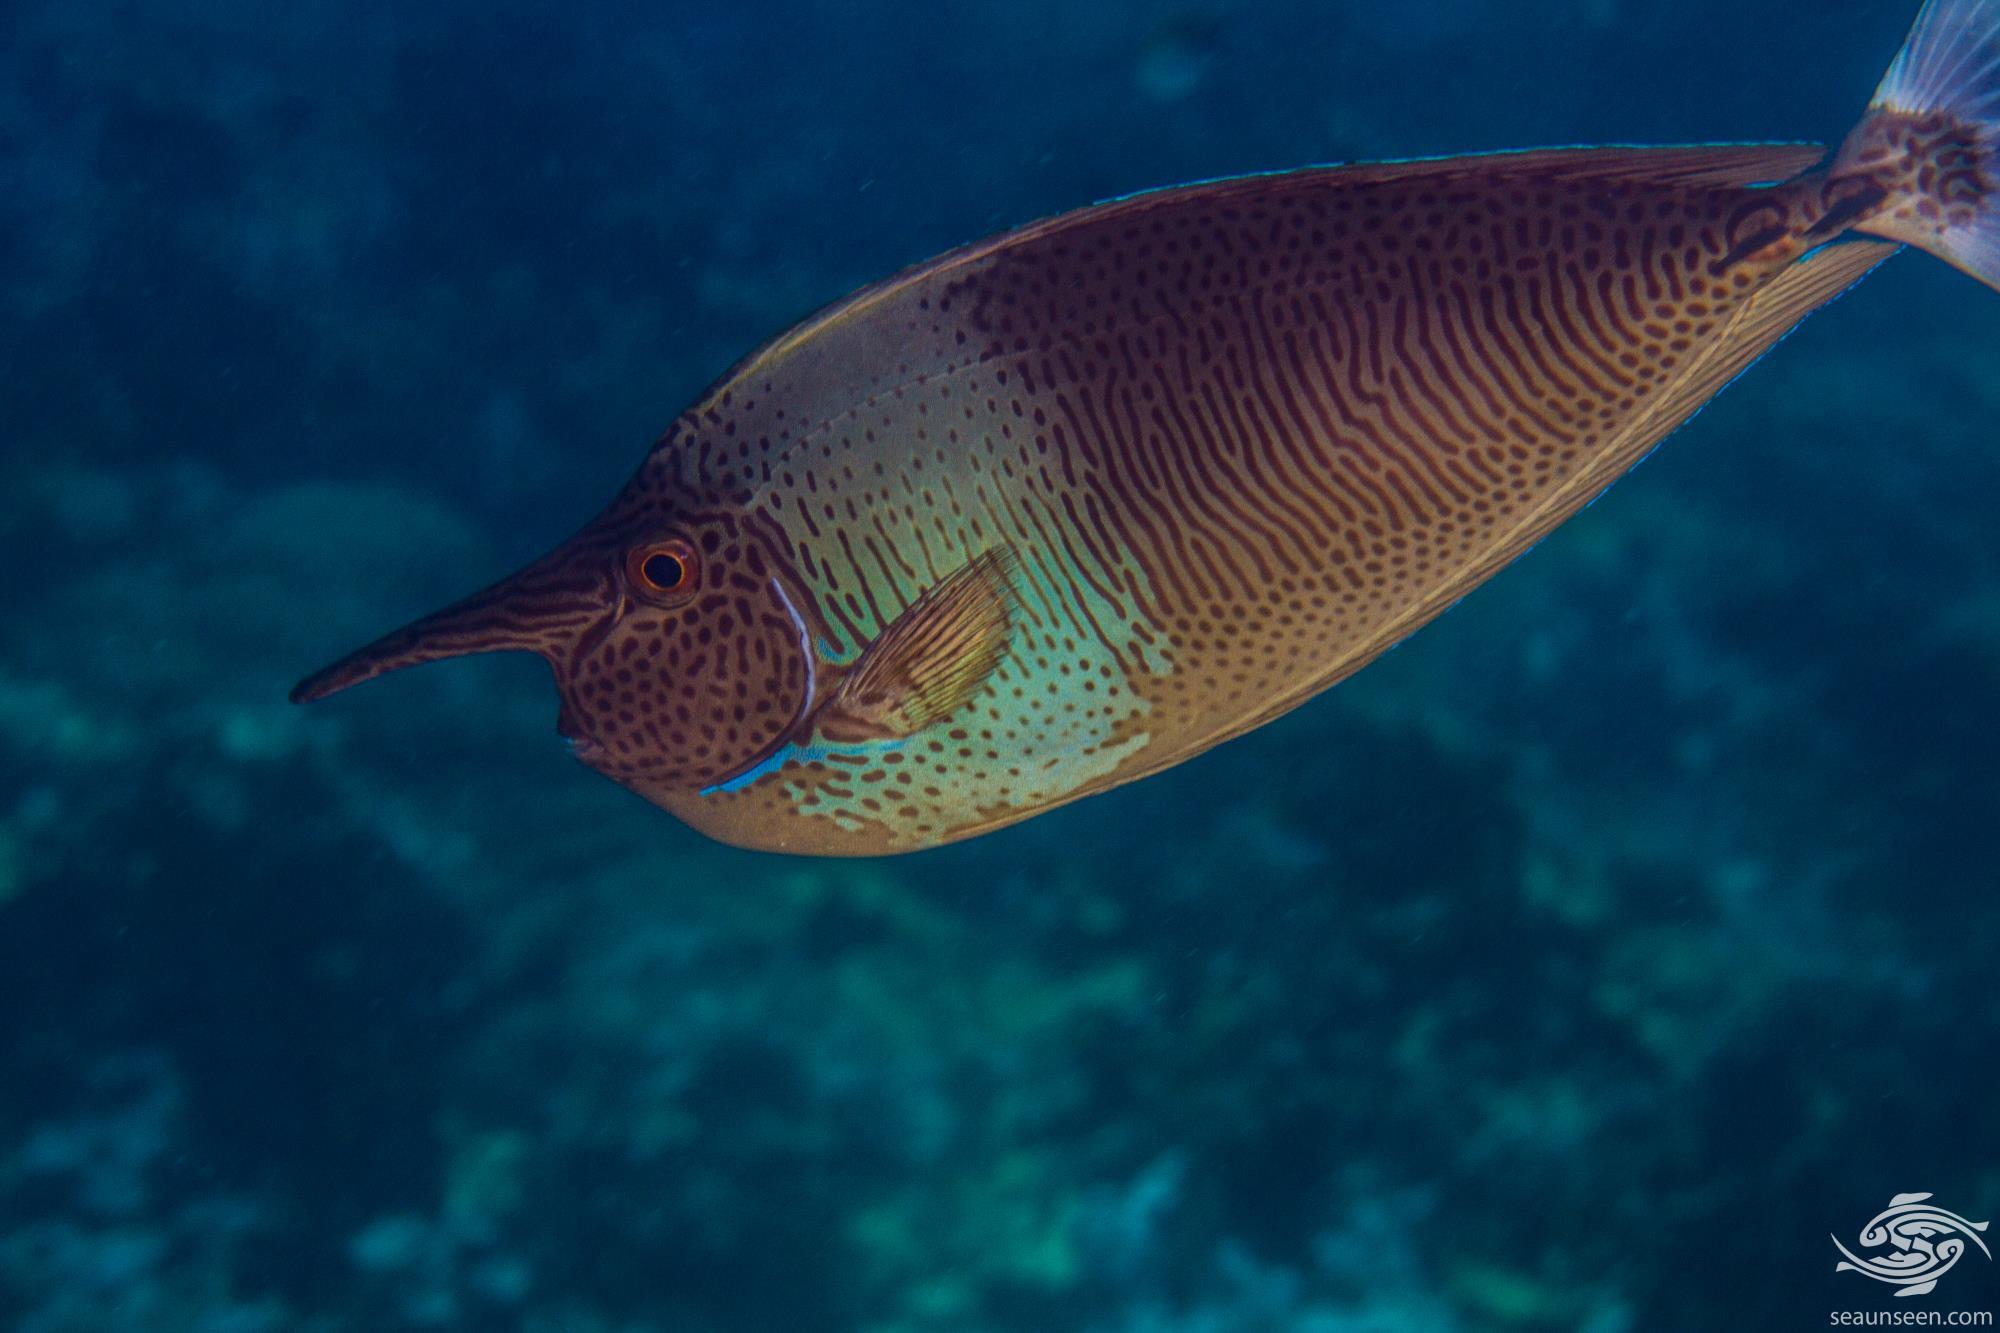 Palefin Unicornfish (Naso brevirostris) also known as the Shortnose Unicornfish, and the Spotted Unicornfish